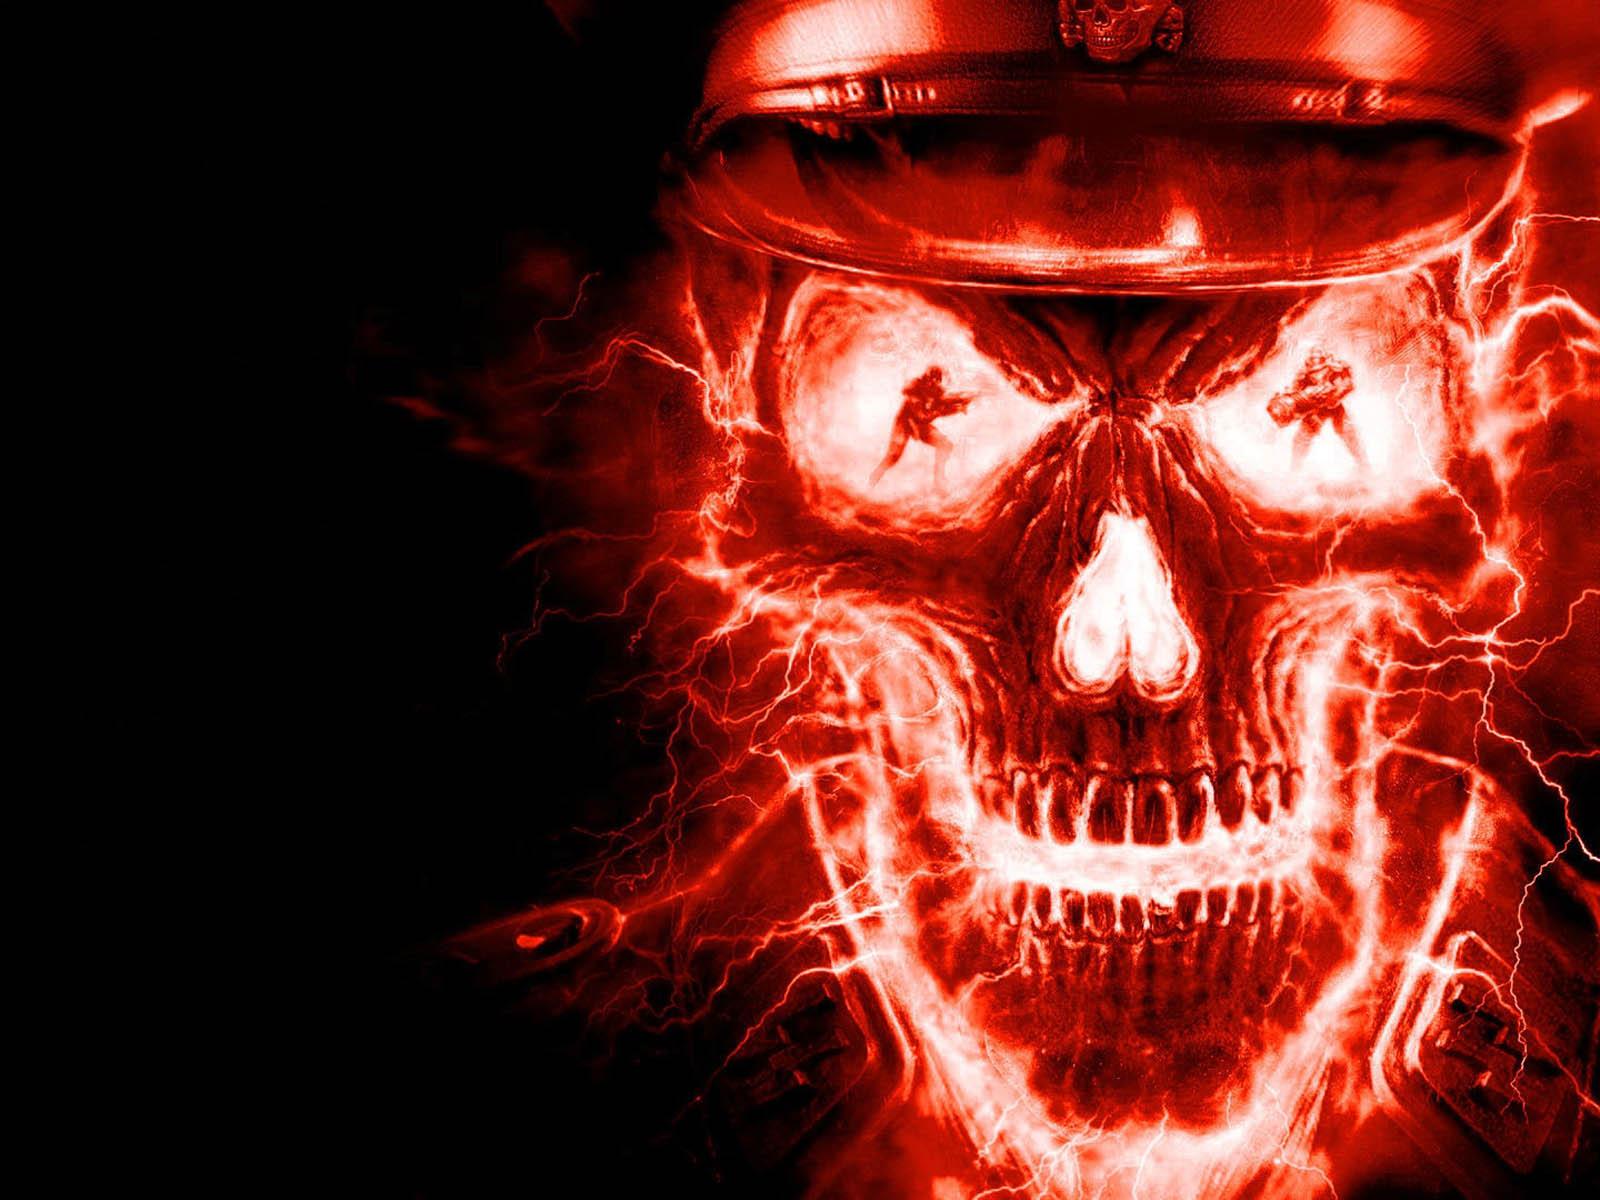 zombie skull wallpapers for desktop - photo #11